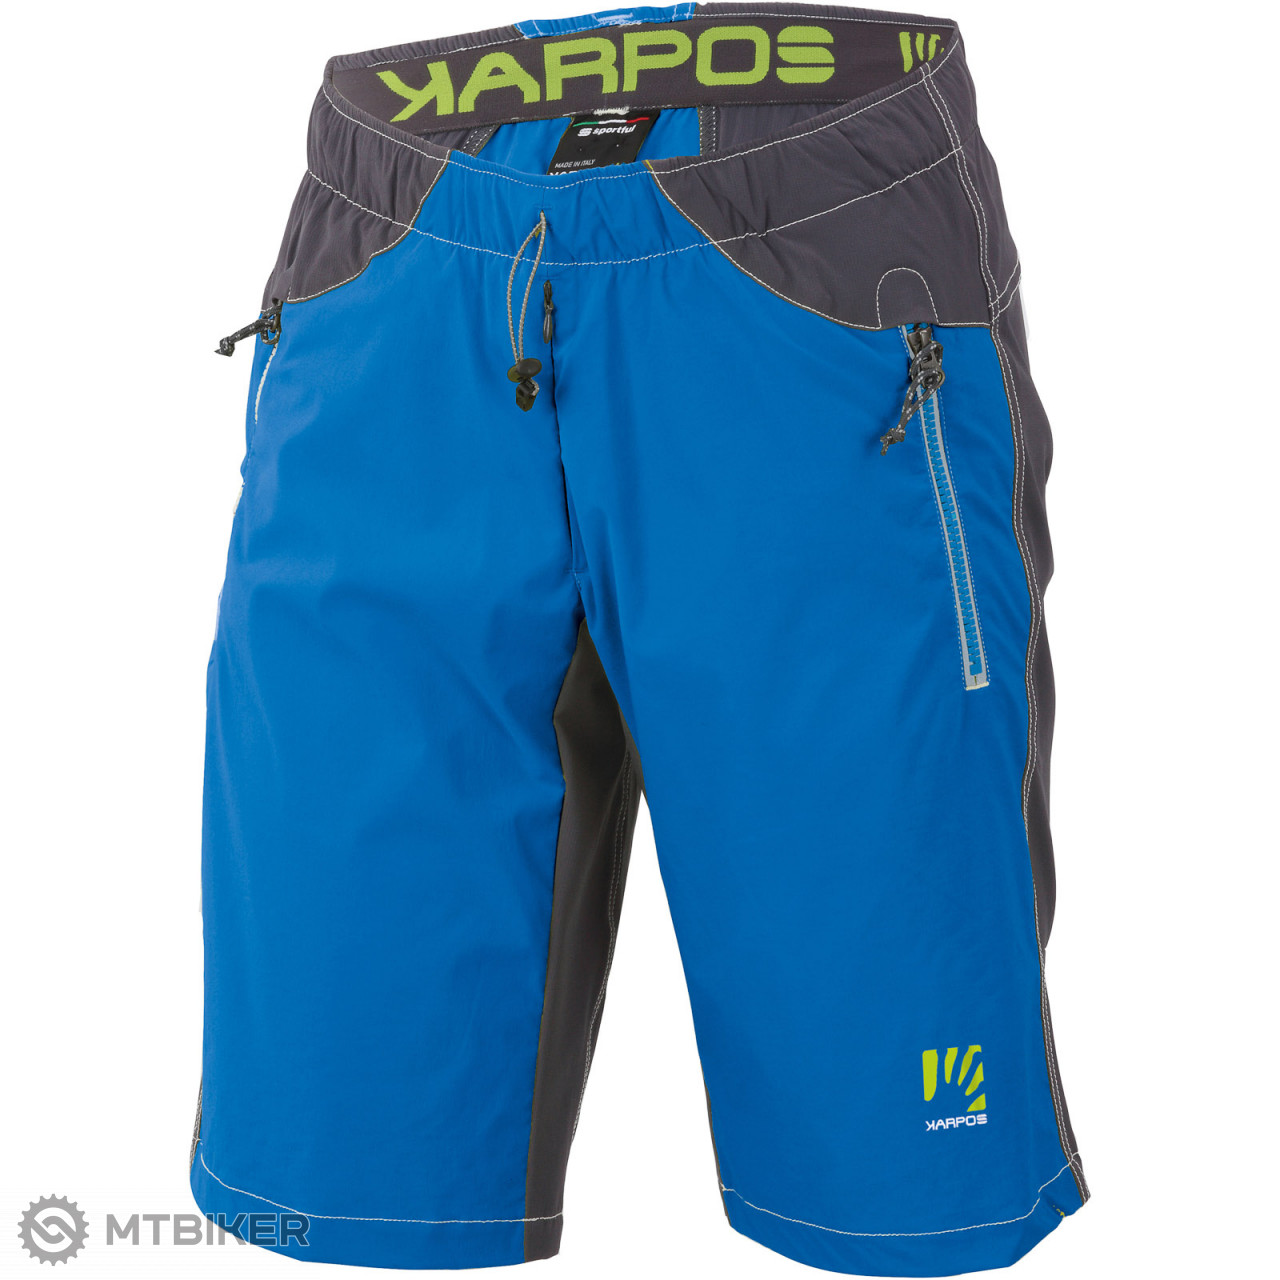 b2887adc56c8 Karpos ROCK Bermudy modré tmavosivé - MTBIKER Shop